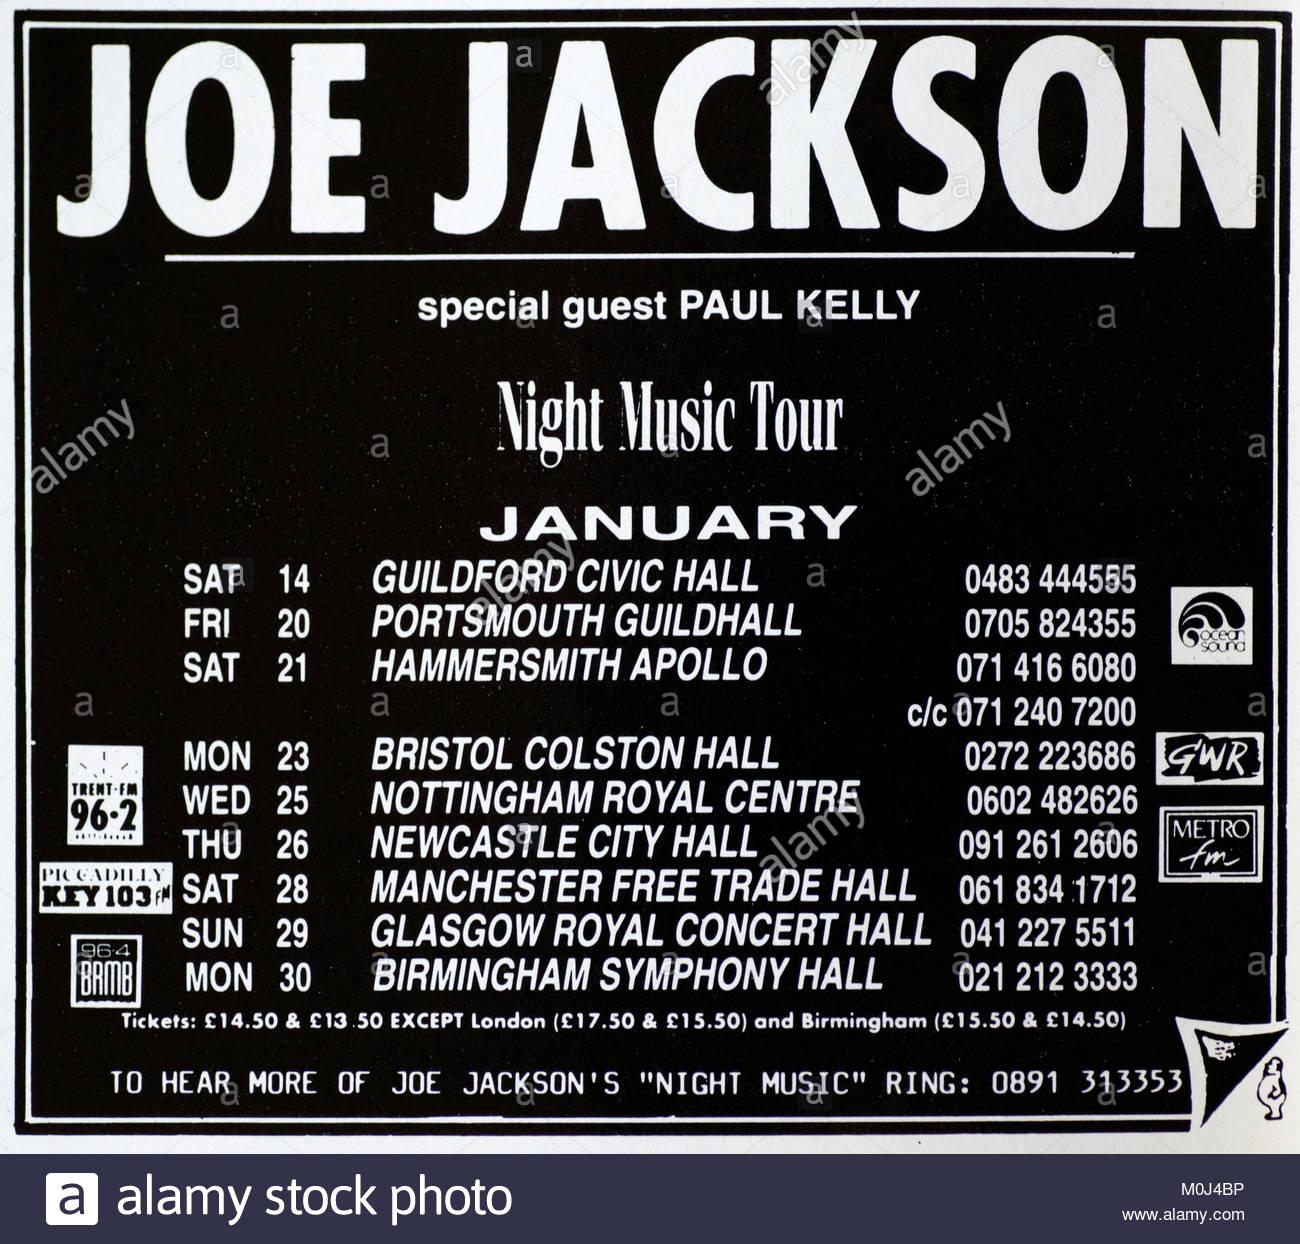 Joe Jackson Stock Photos & Joe Jackson Stock Images - Alamy